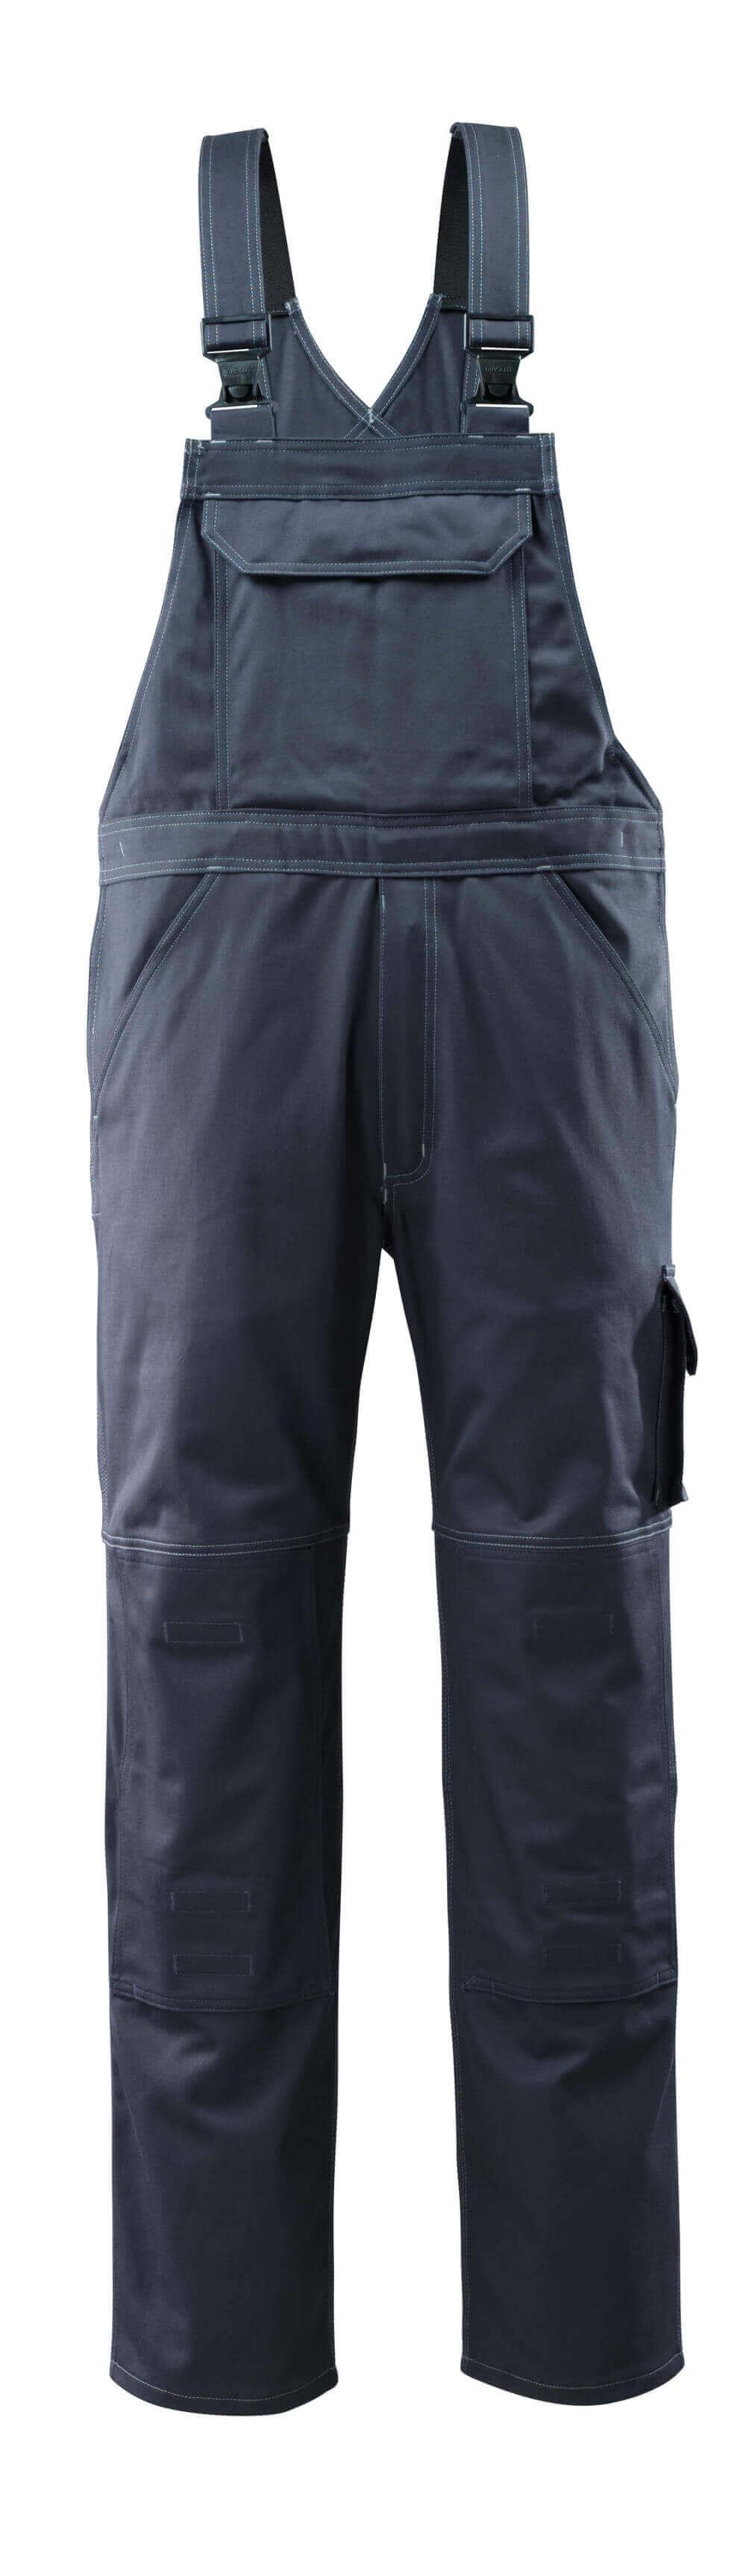 12362-630-010 Bib & Brace with kneepad pockets - dark navy